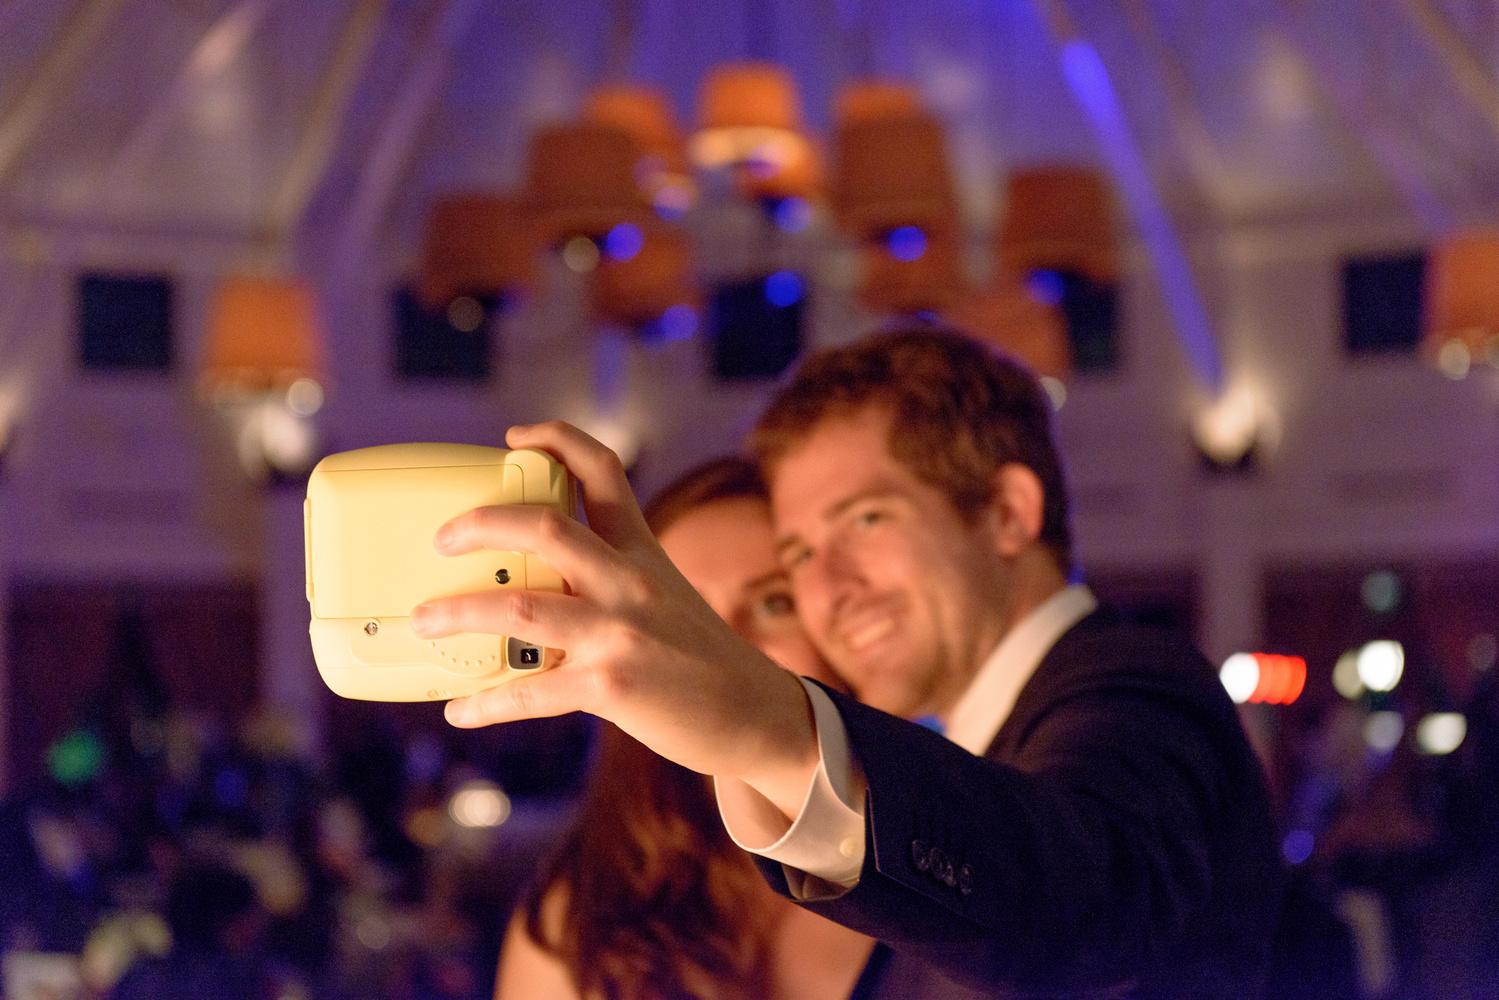 Nikon D7100 Wedding Photography: The Bare-Bones Minimum Gear Needed To Photograph A Wedding